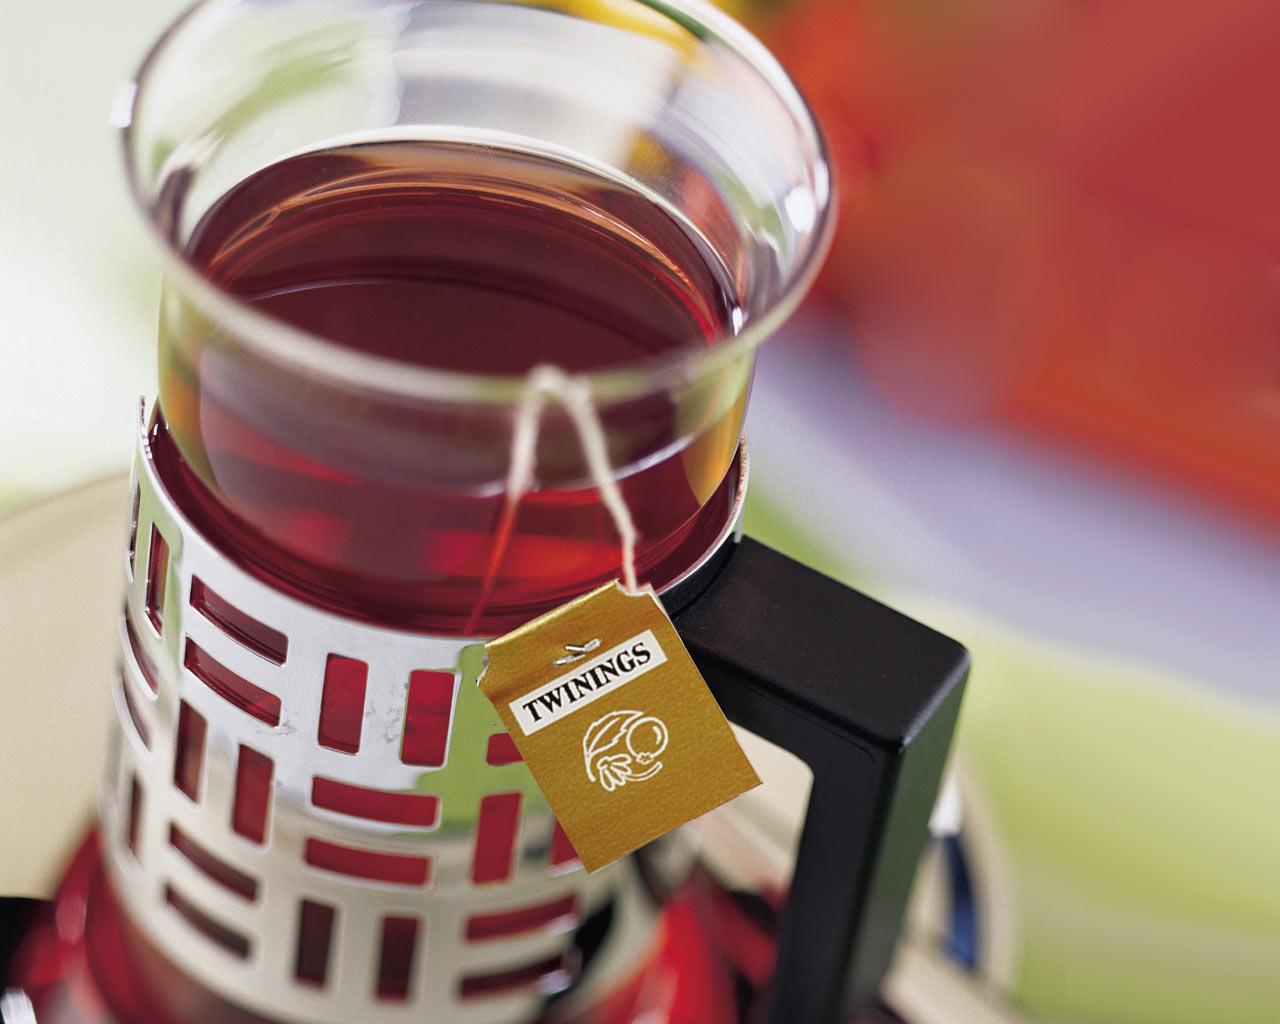 Twinings Fruit Infusion Tea